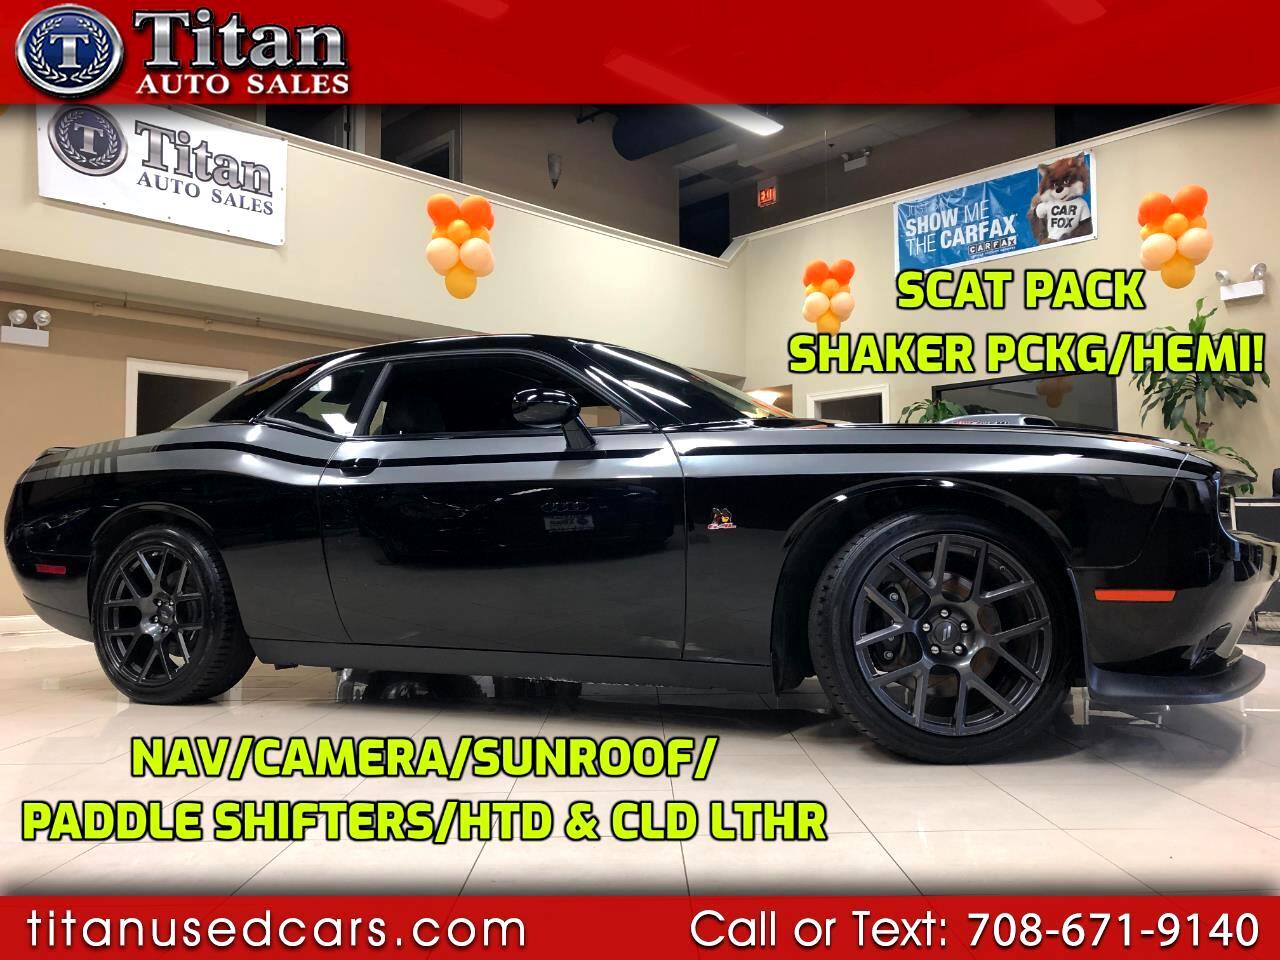 2017 Dodge Challenger 392 Hemi Scat Pack Shaker Coupe